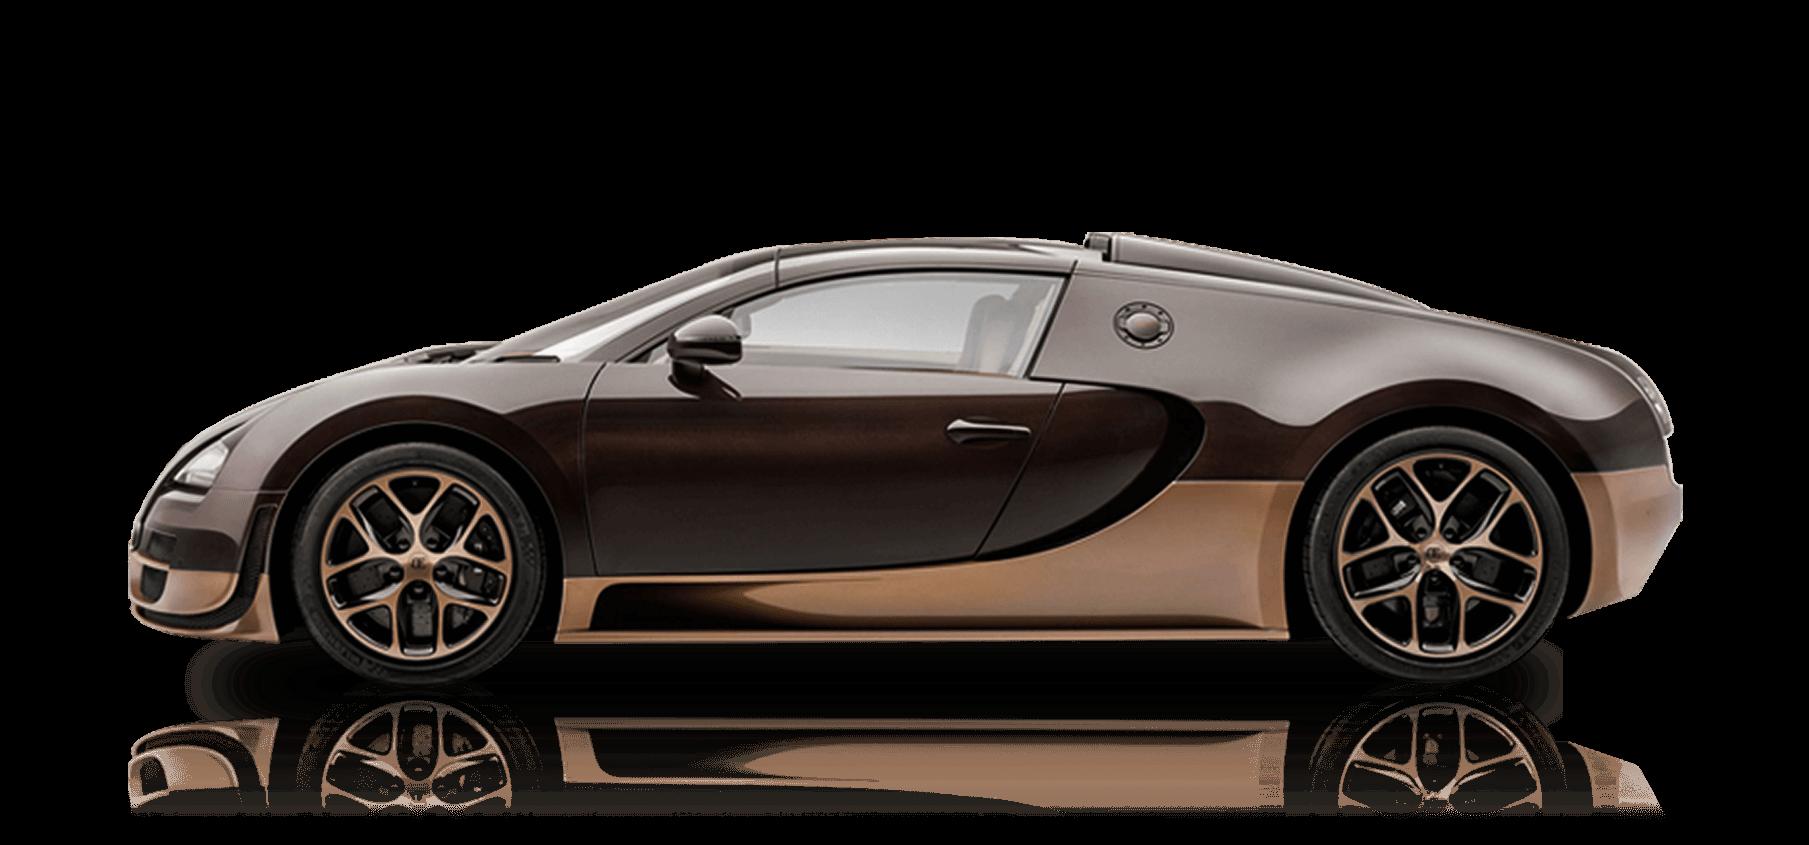 jbr500_bughatti-veyron